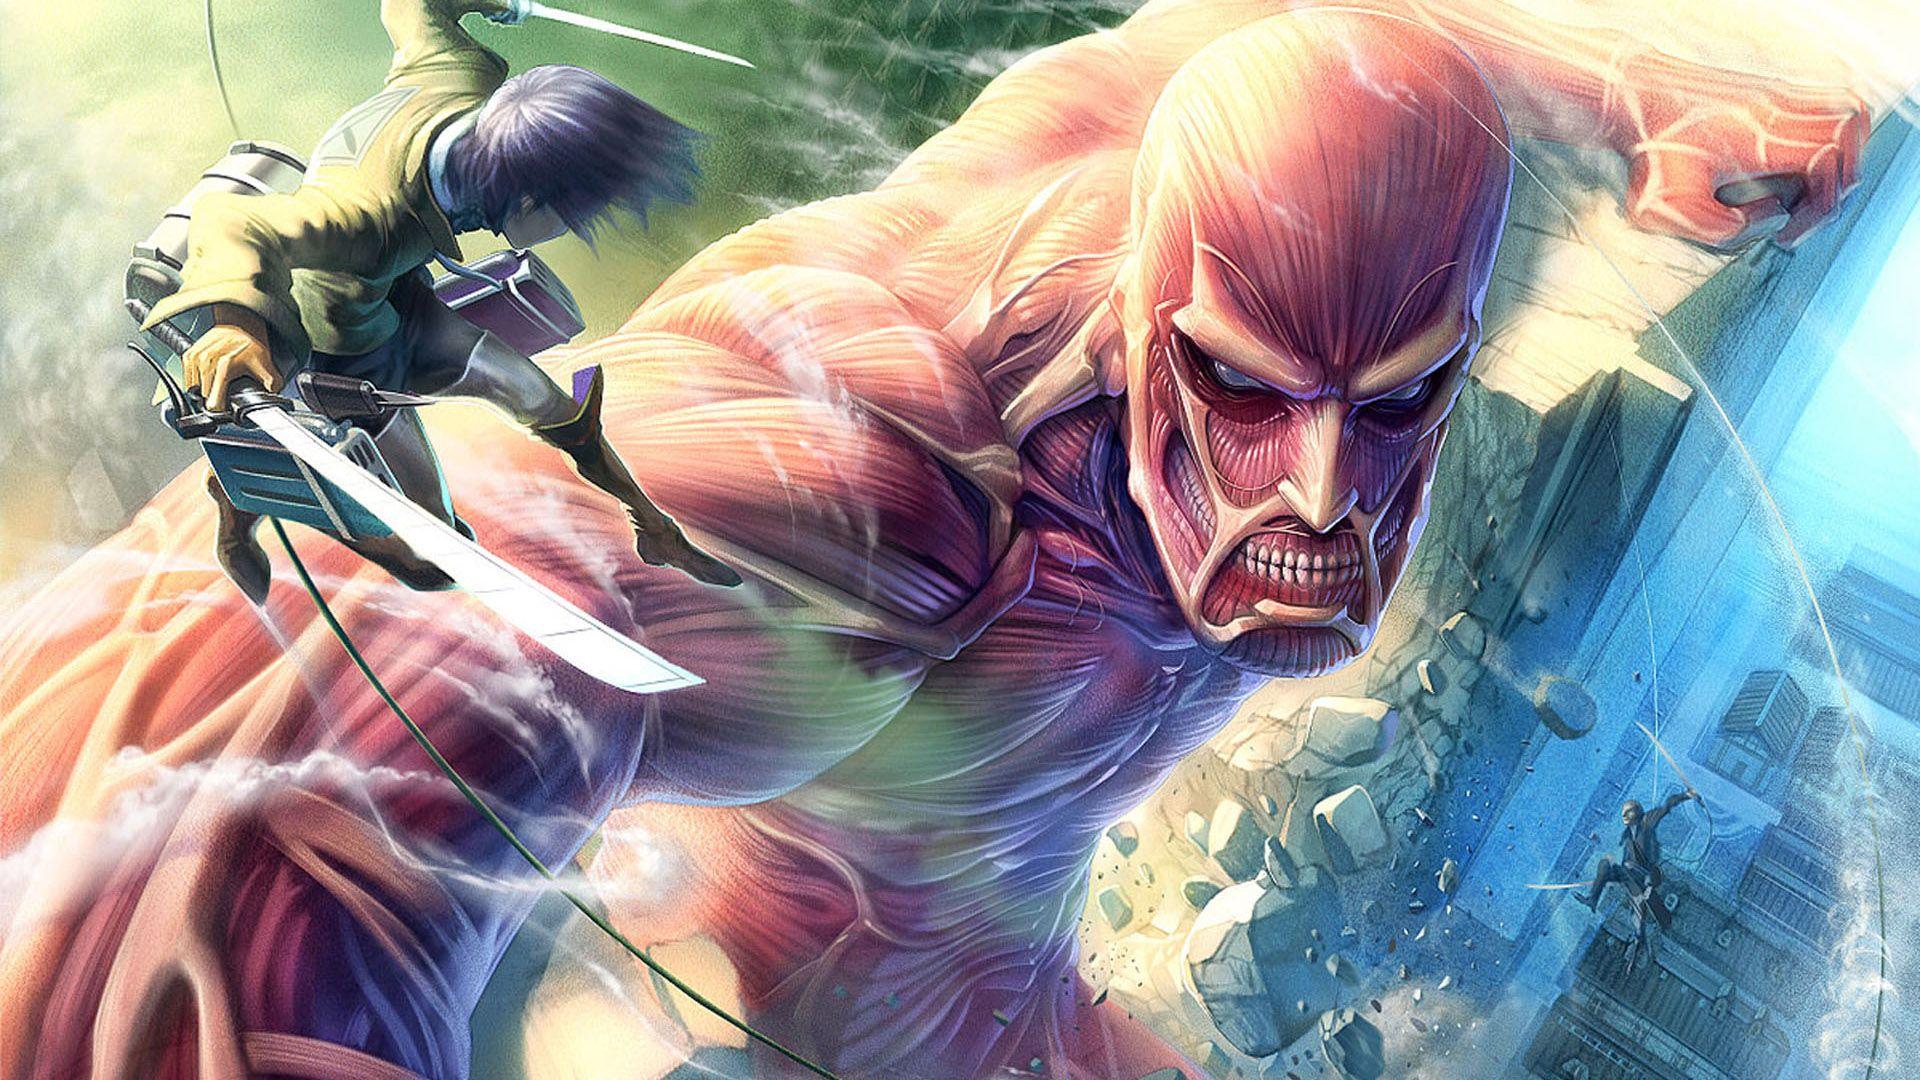 Titan Colosal Attack On Titan Wallpaper Places To Visit